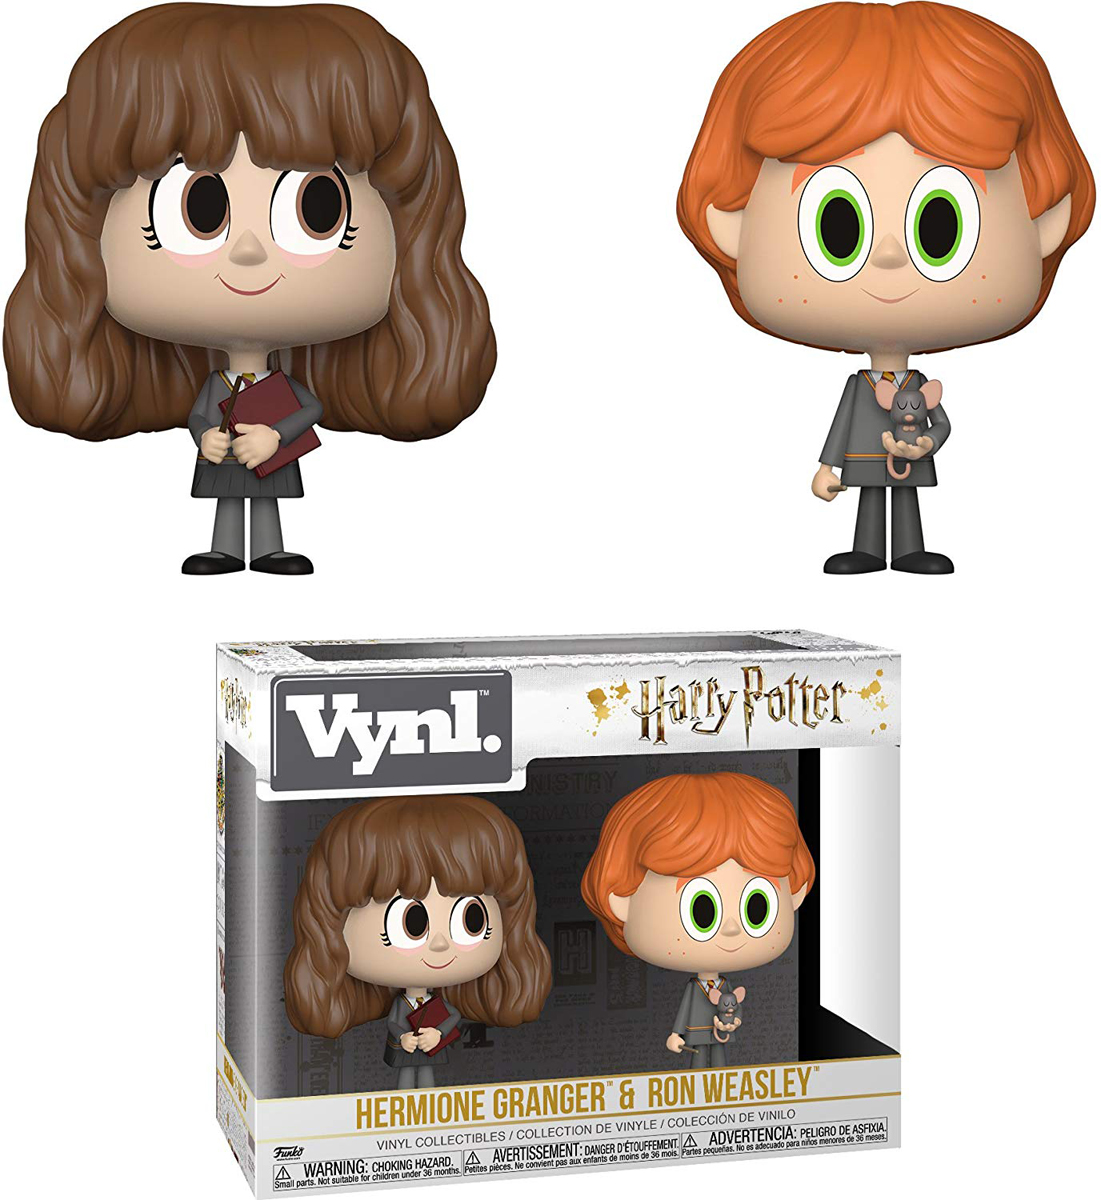 Funko POP! Vinyl Фигурка Games: Harry Potter 2PK Ron & Hermione 30001 фигурка funko pop harry potter – hermione granger with time turner 9 5 см